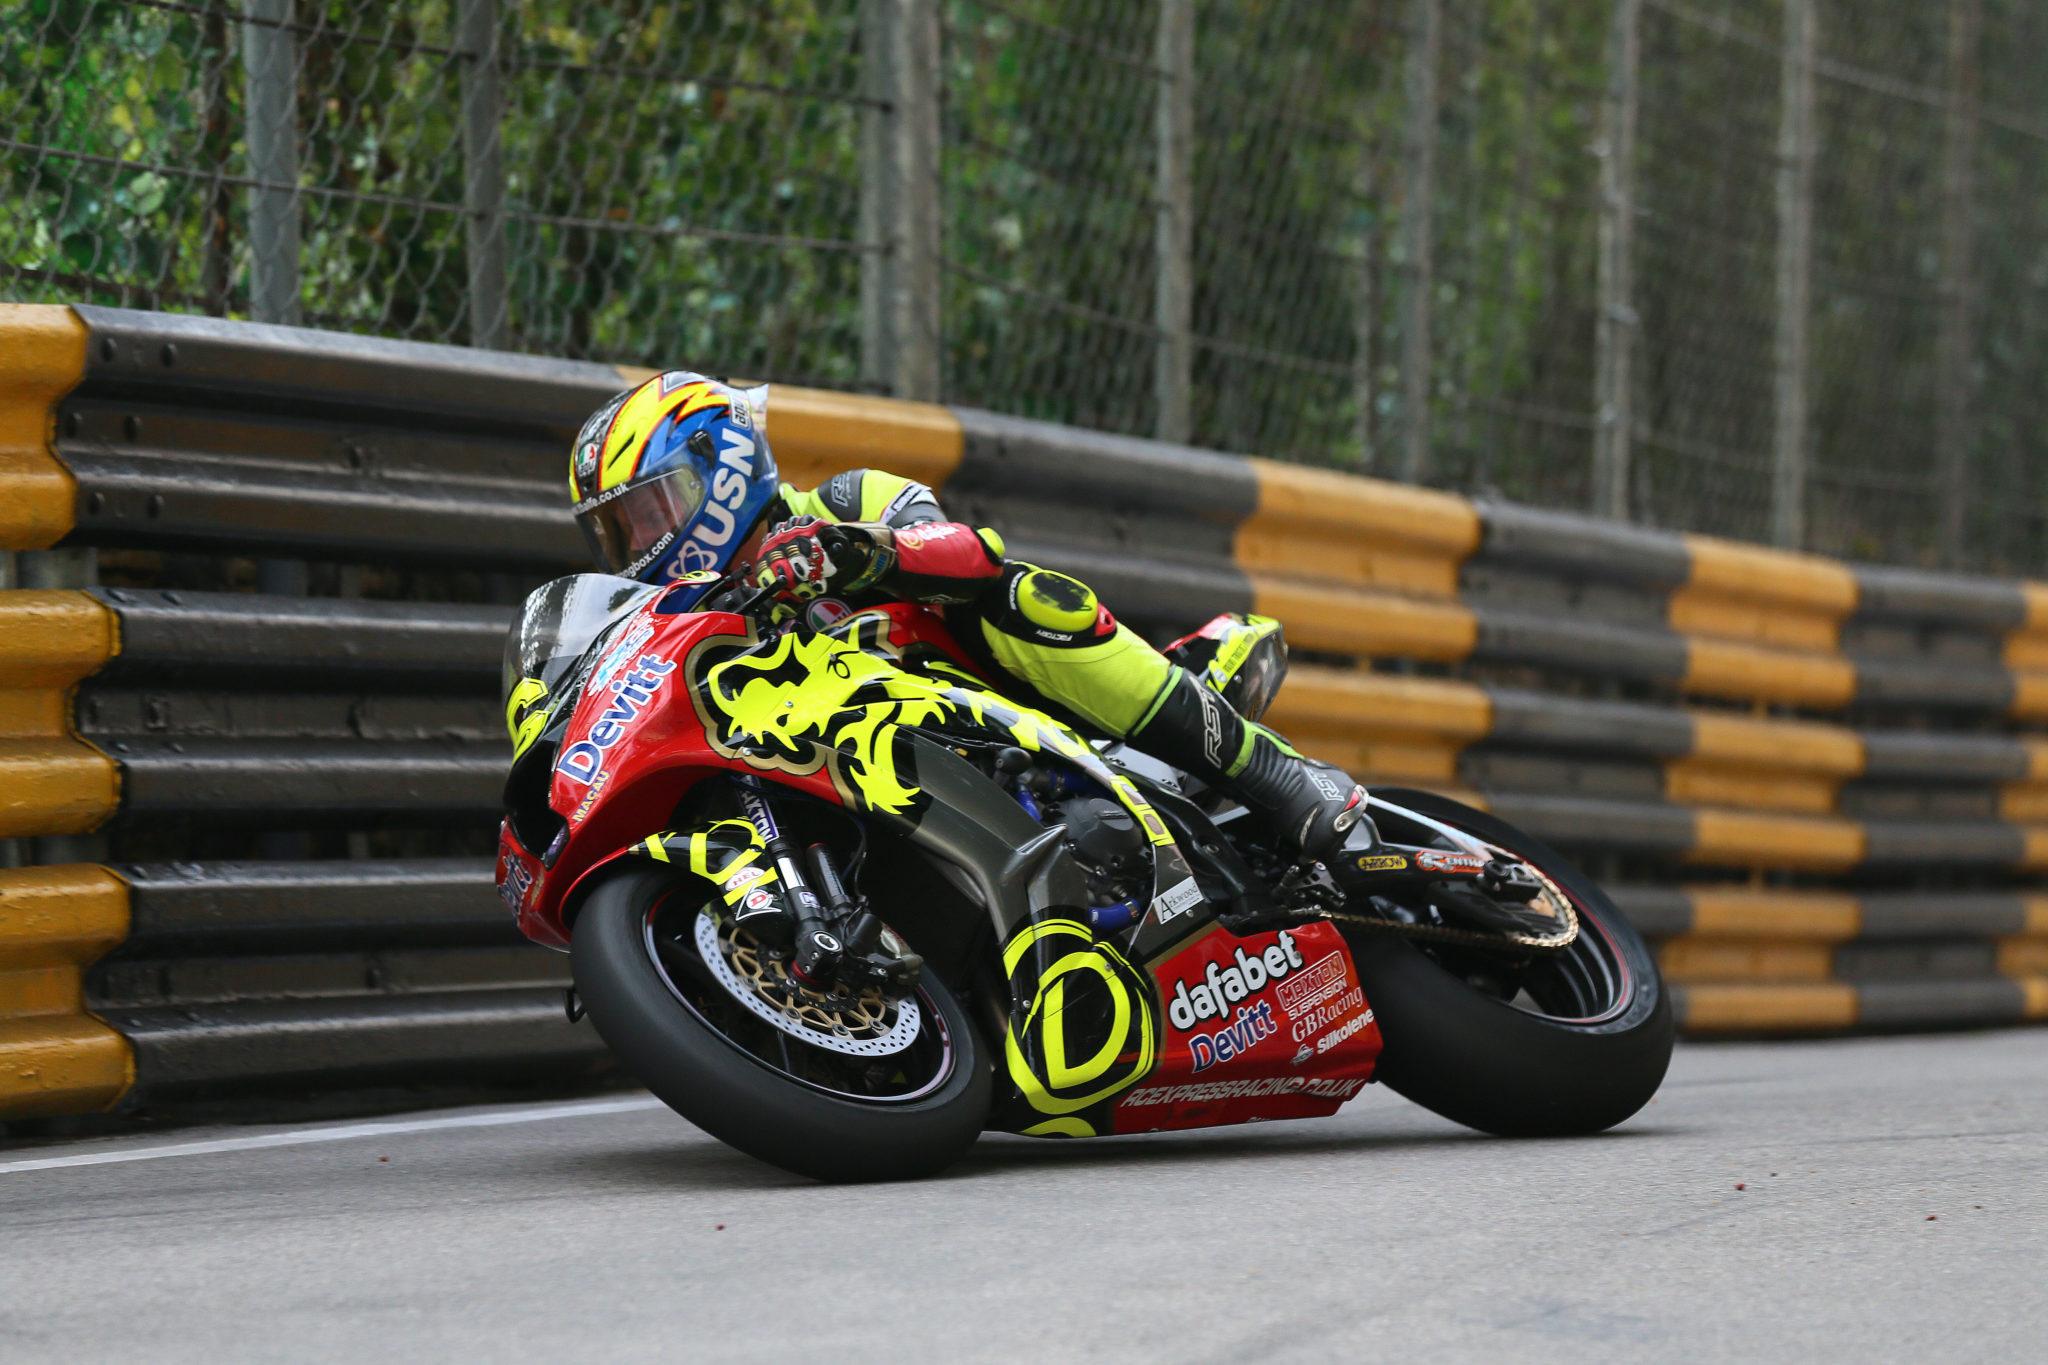 PACEMAKER, BELFAST, 17/11/2017: Ivan Lintin (Devitts Dafabet Kawasaki) at Moorish Hill during final qualifying for the Macau Grand Prix.